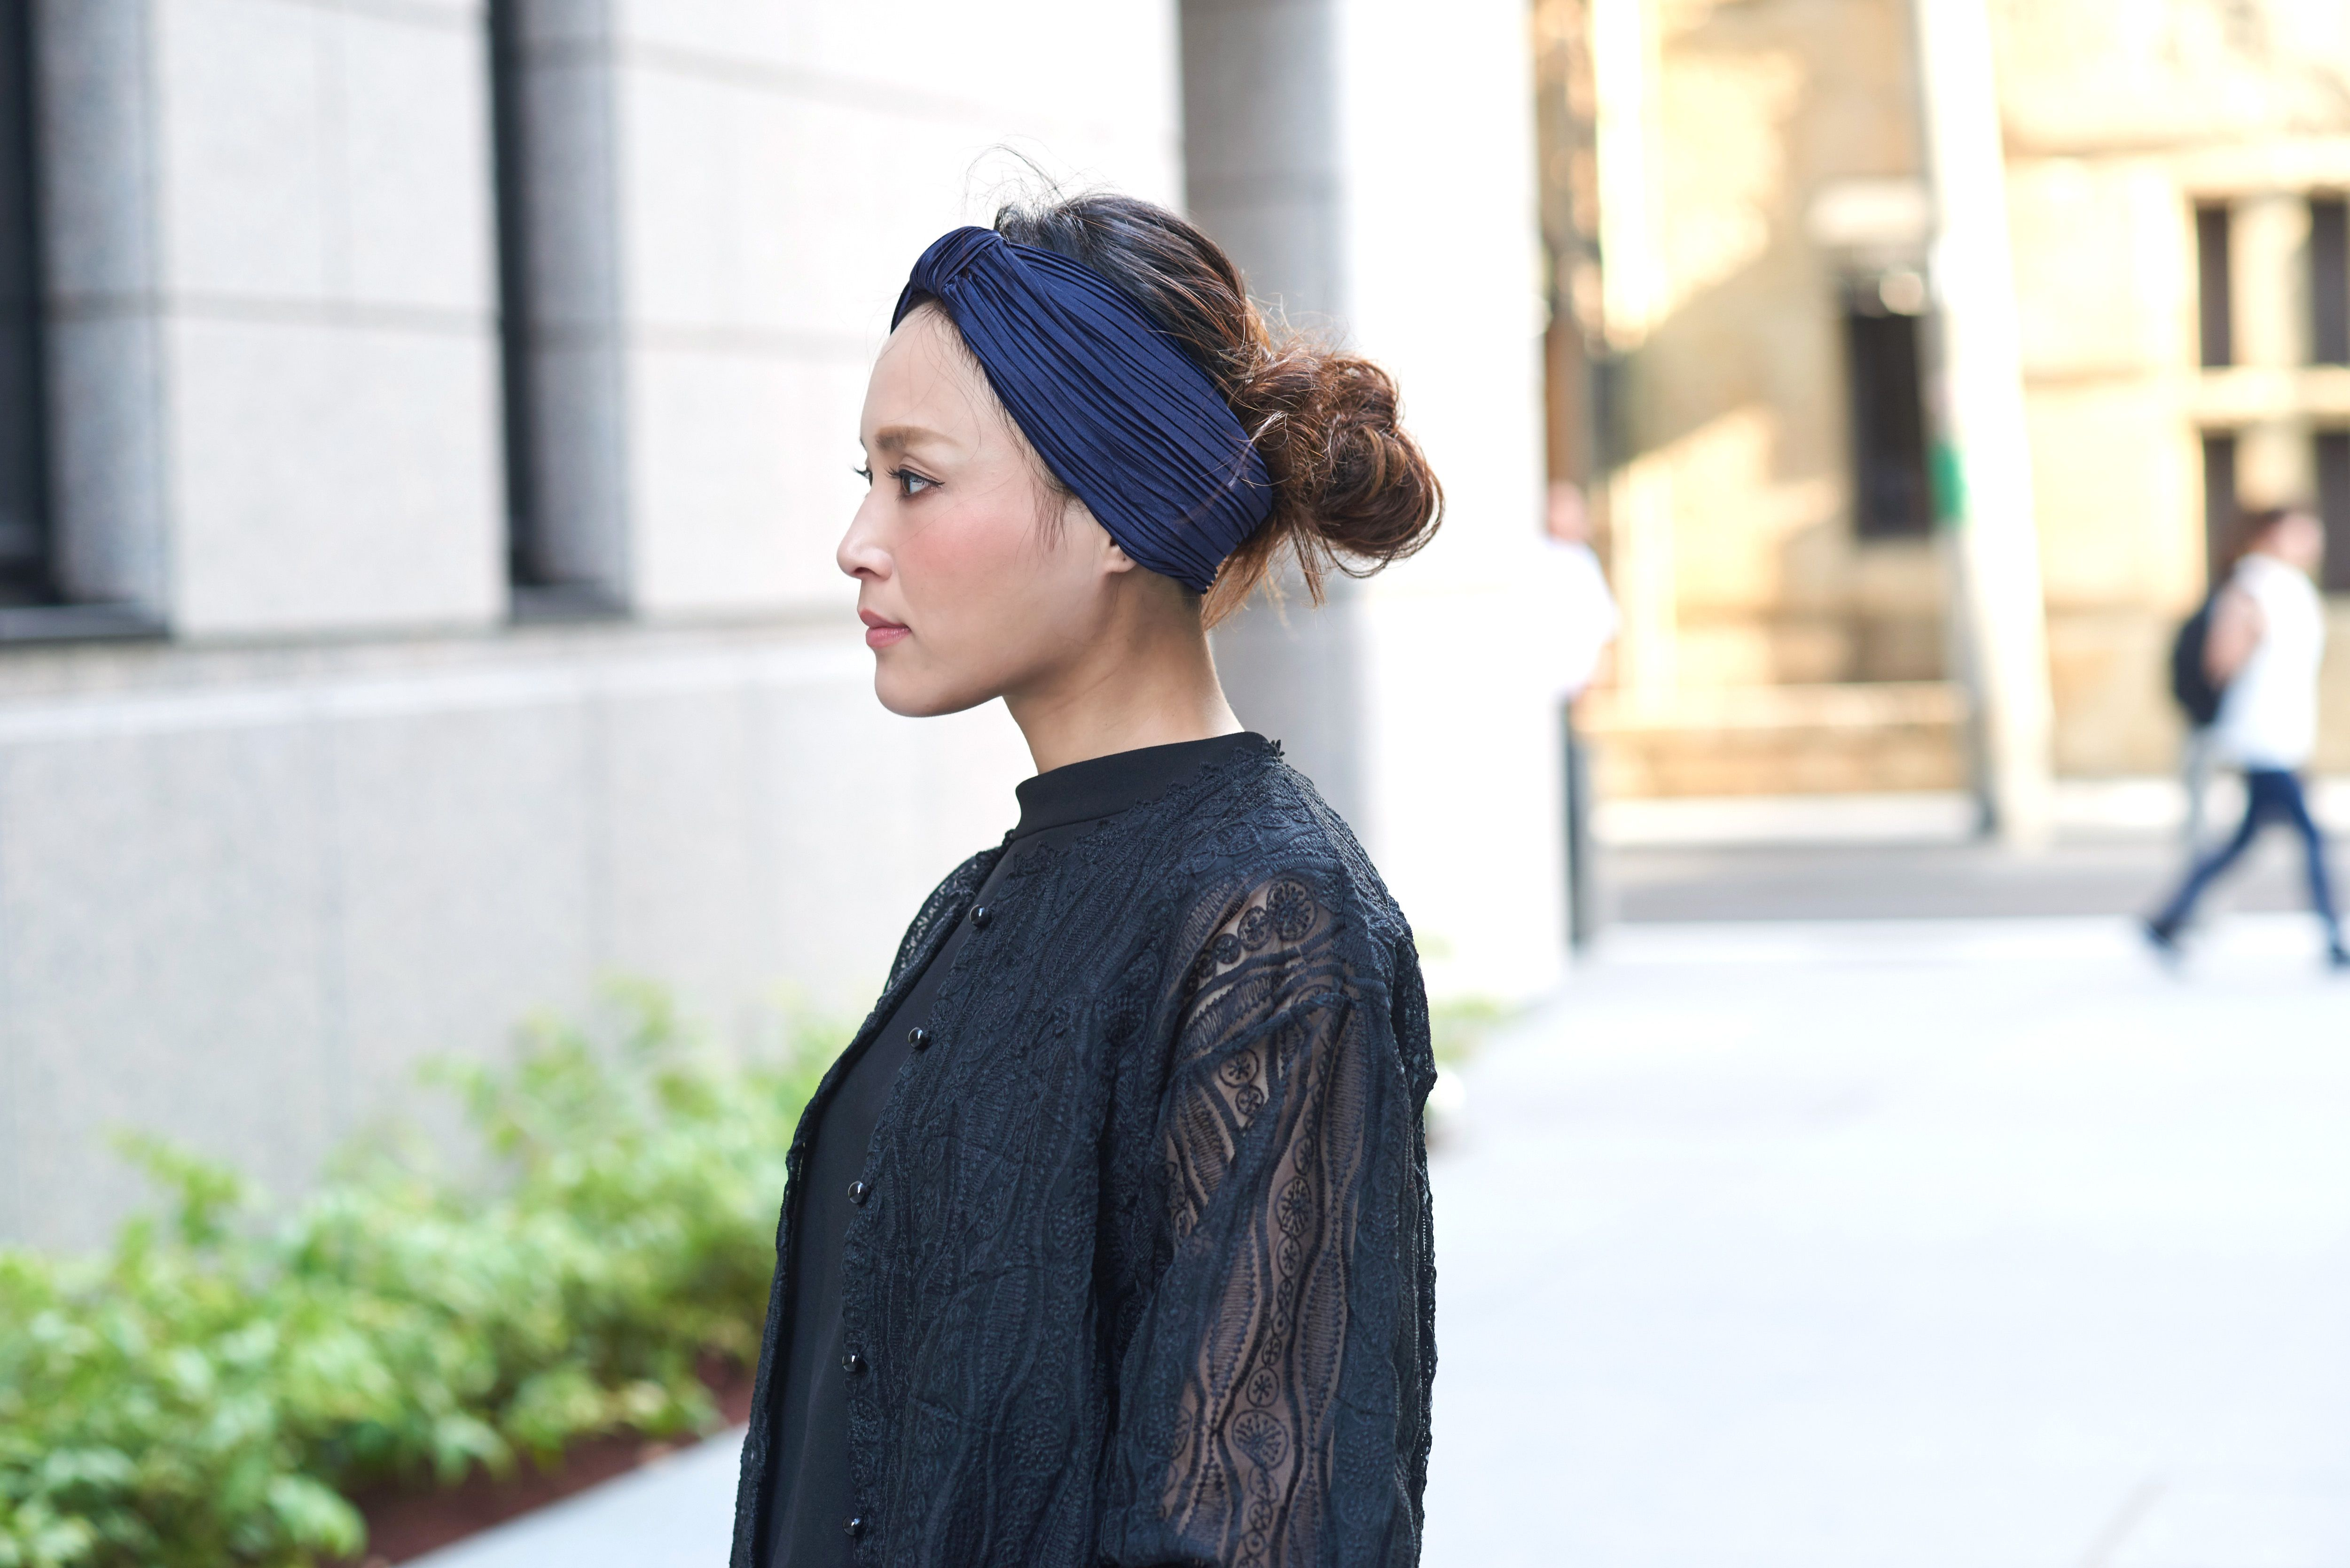 Hair Accessories Fashion Hairbands  Wide Turban Women Headbands  Headwear